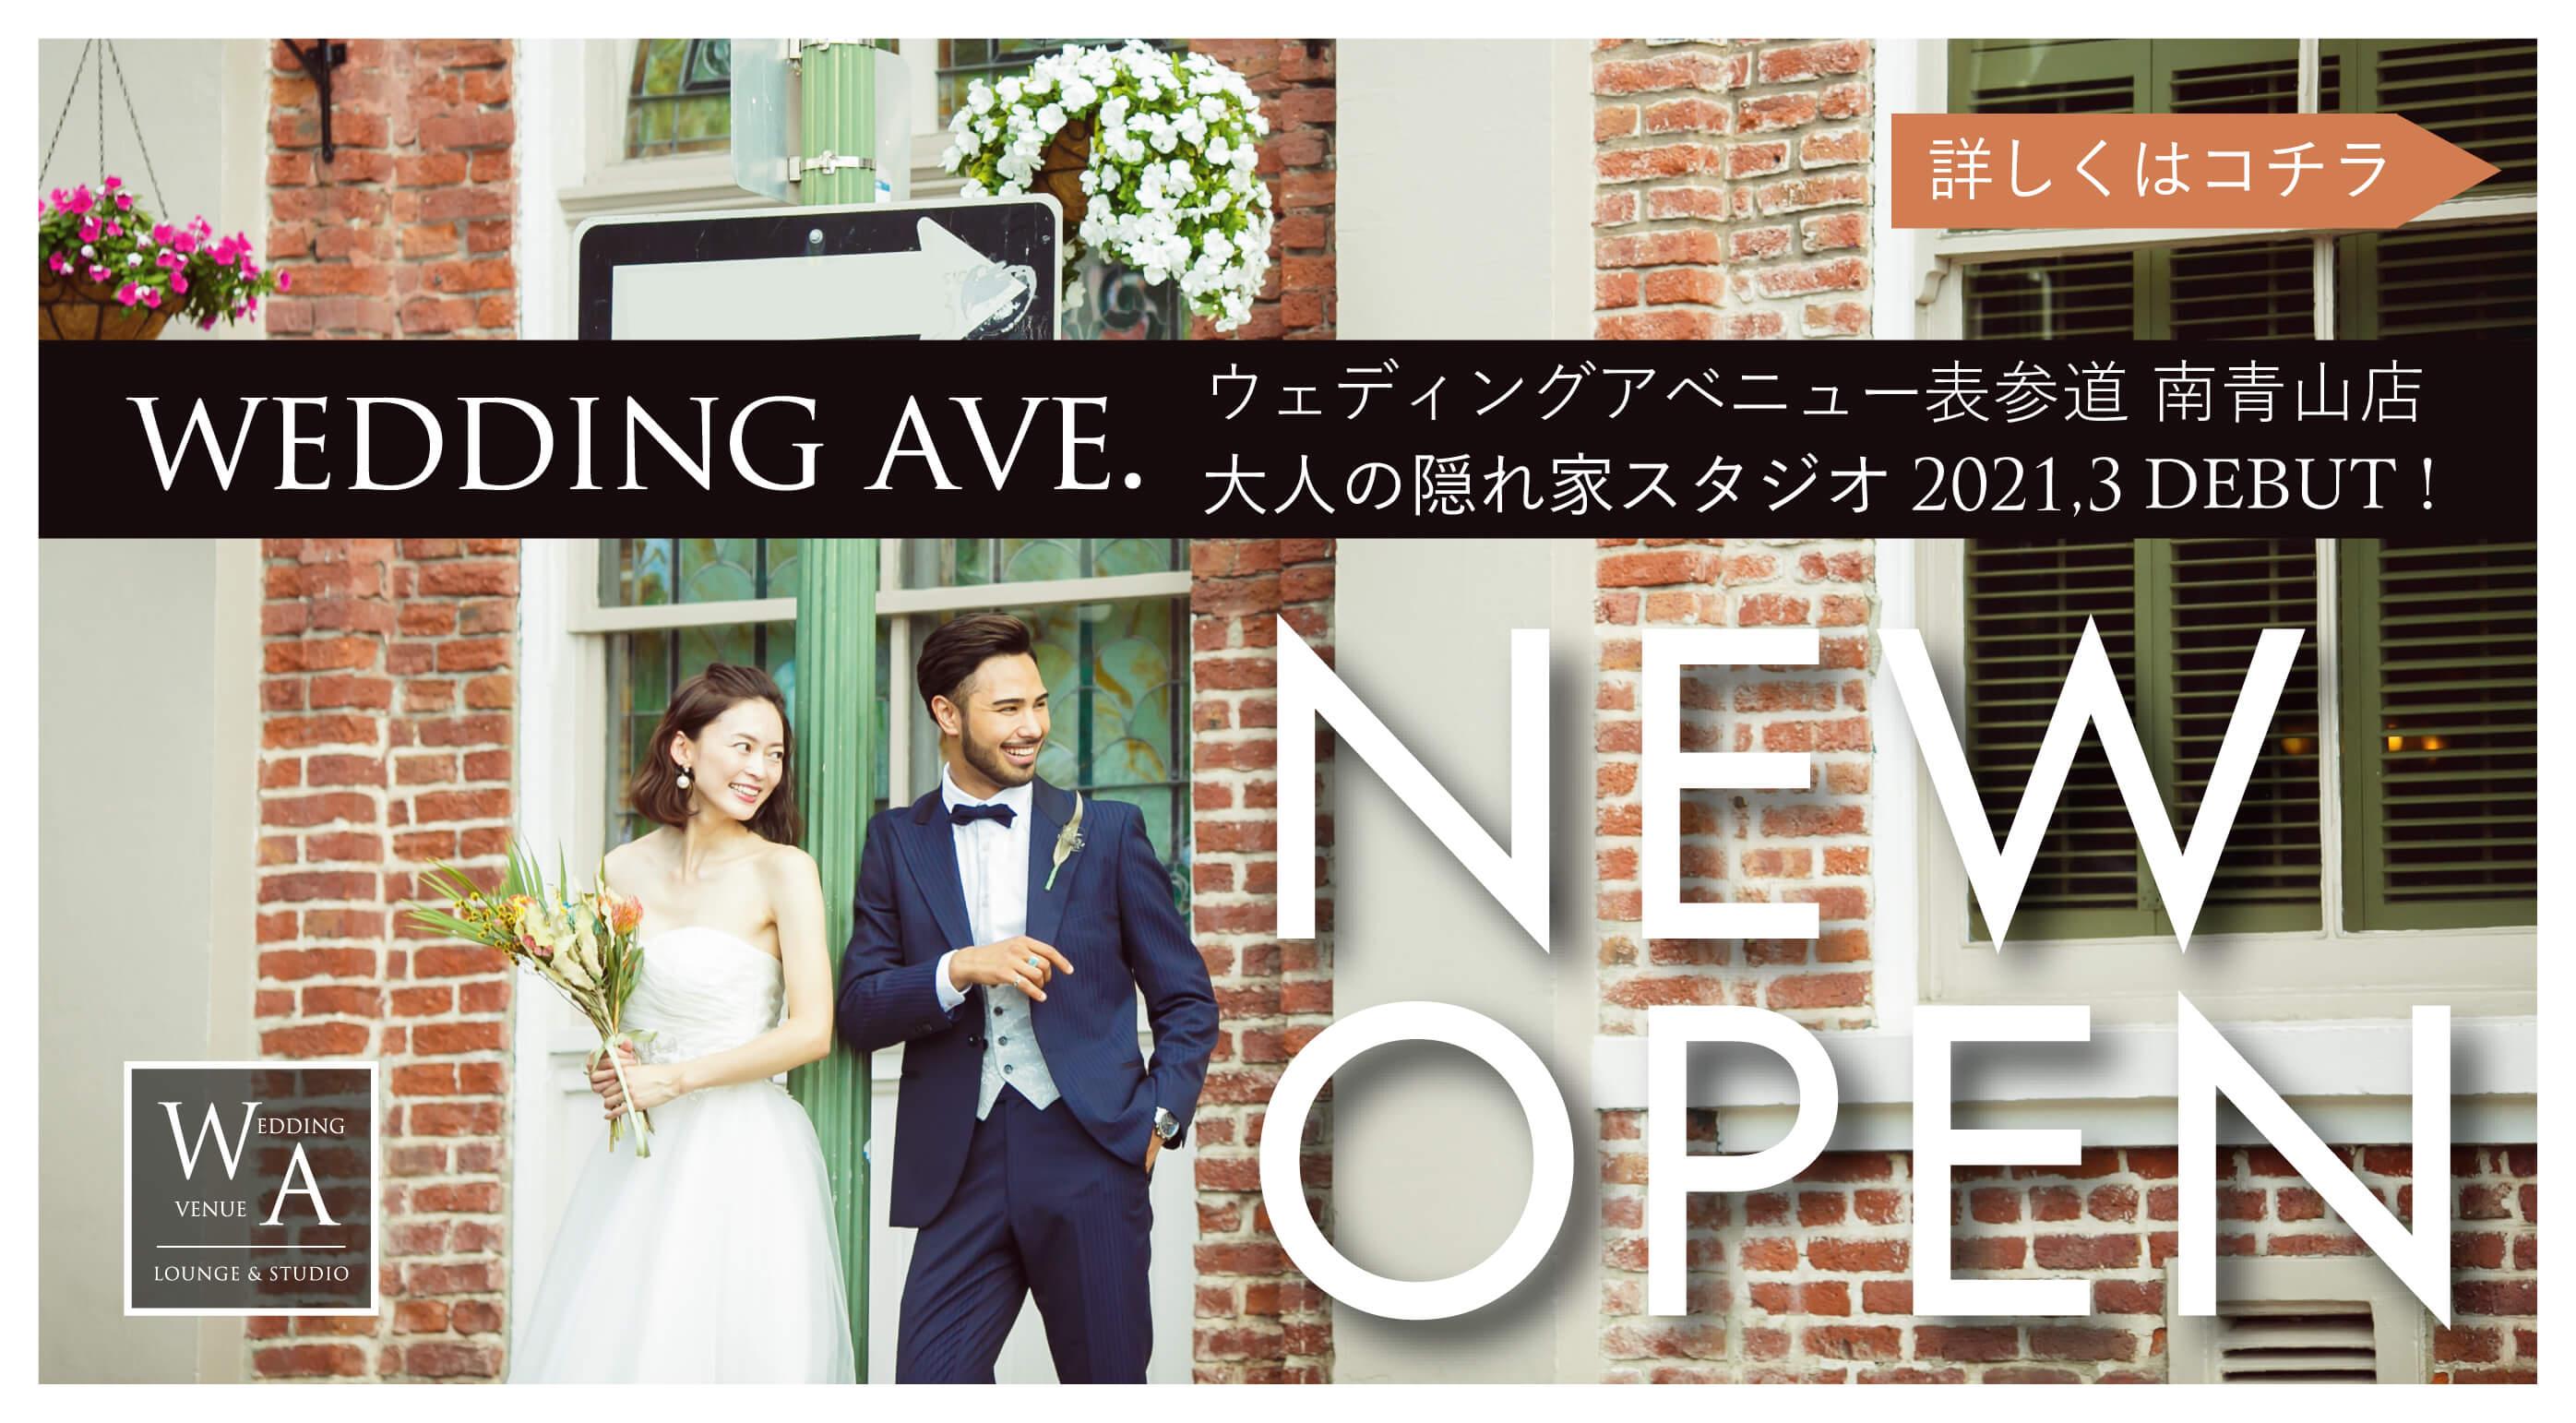 WEDDING AVE. ウェディングアベニュー表参道 南青山店 大人の隠れ家スタジオ 2021,3 DEBUT! 詳しくはこちら